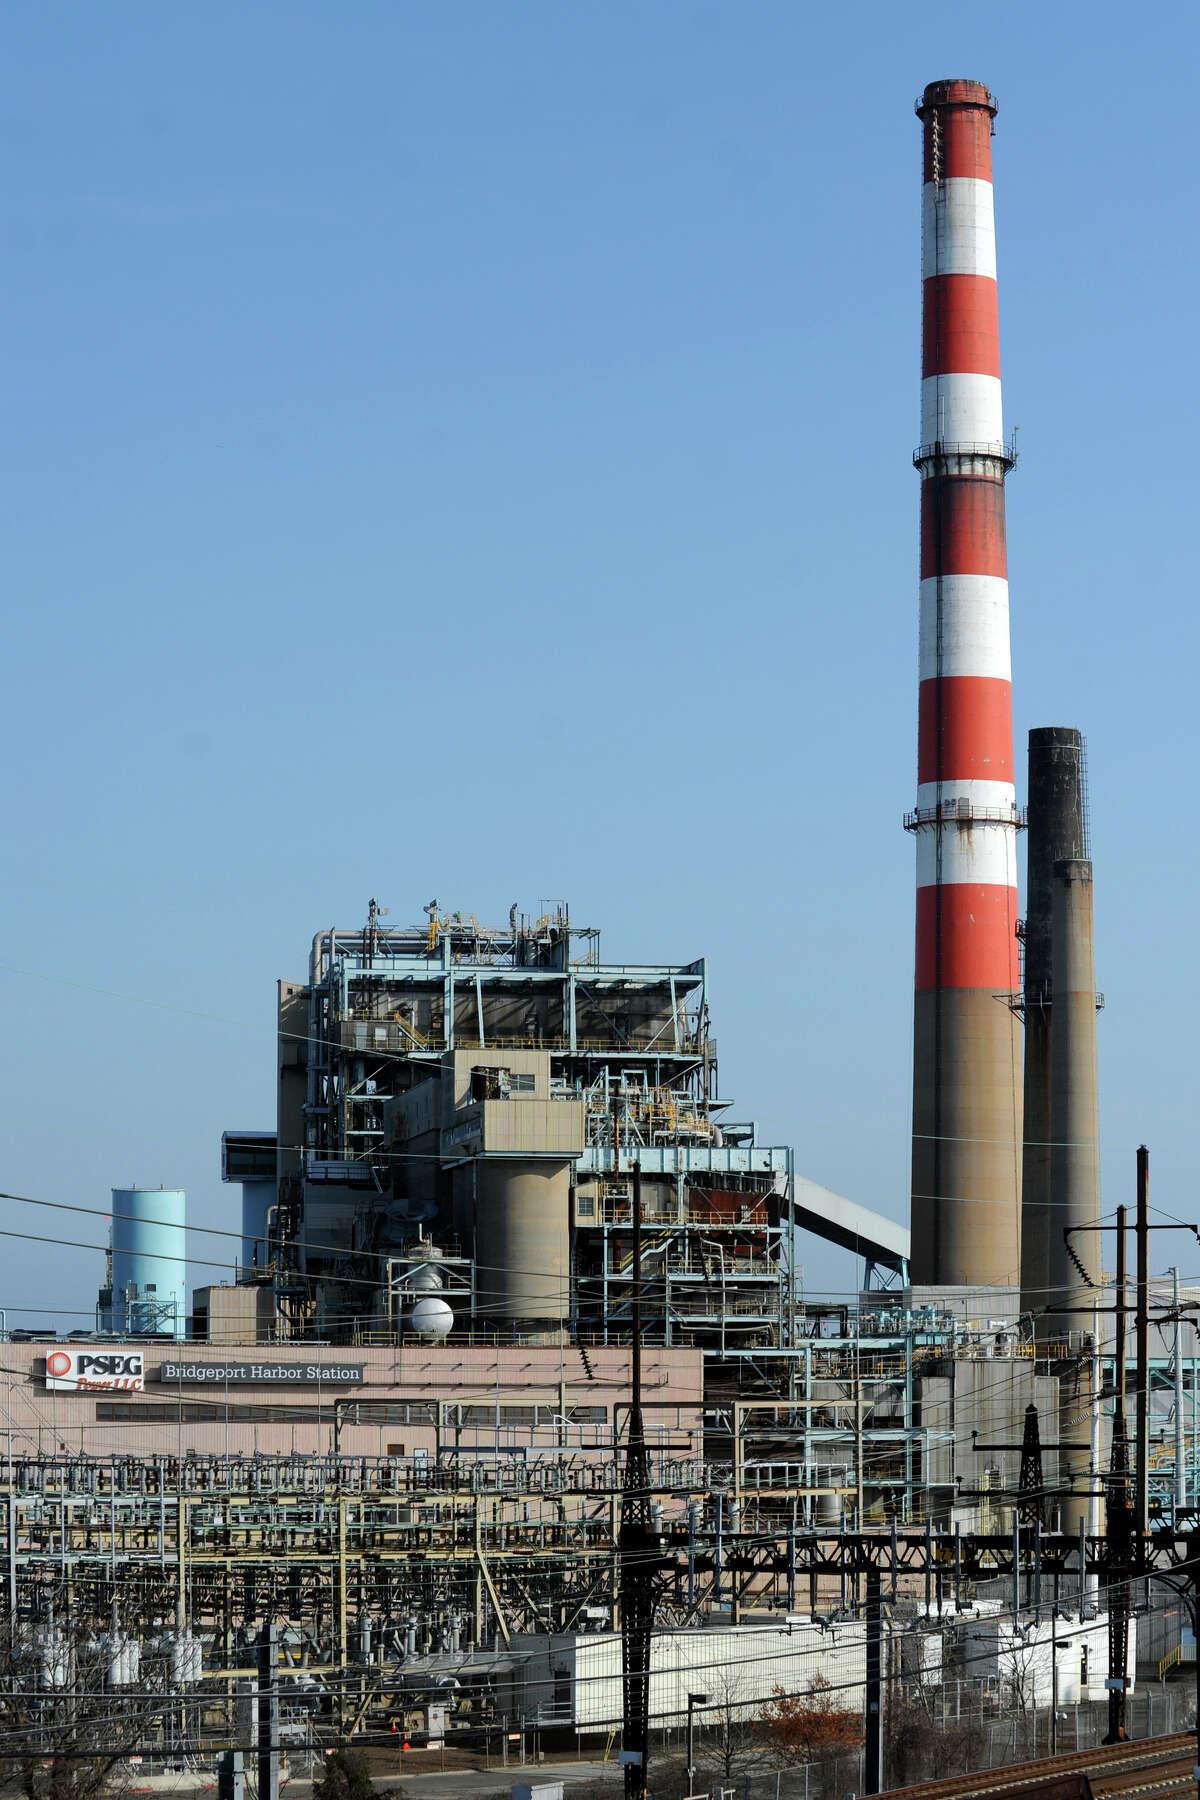 PSEG's Bridgeport Harbor Station power plant, in Bridgeport, Conn., April 24th, 2013.